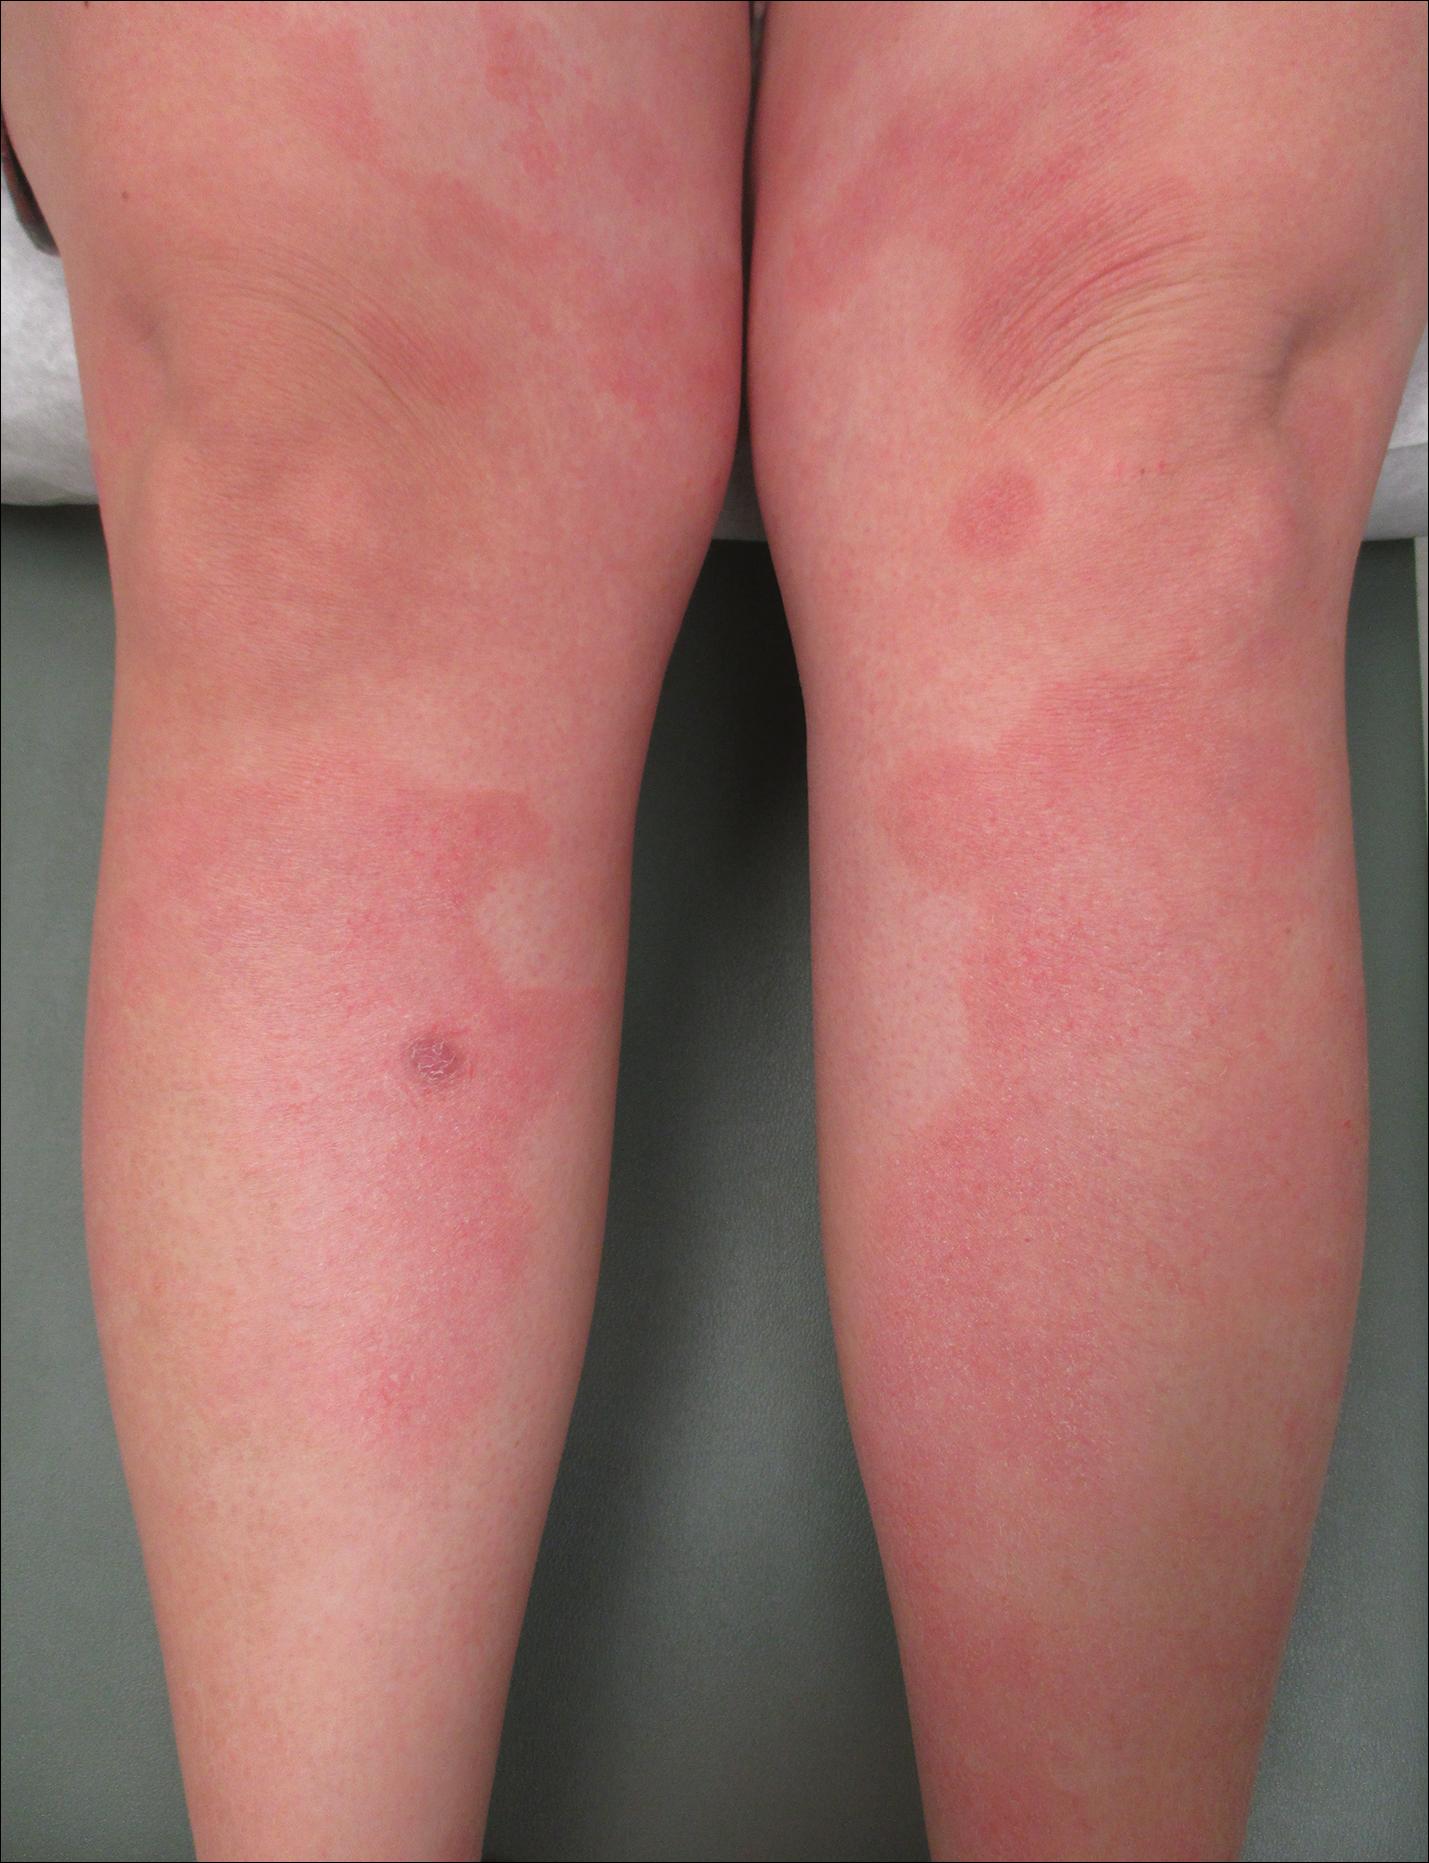 developed psoriasis after pregnancy